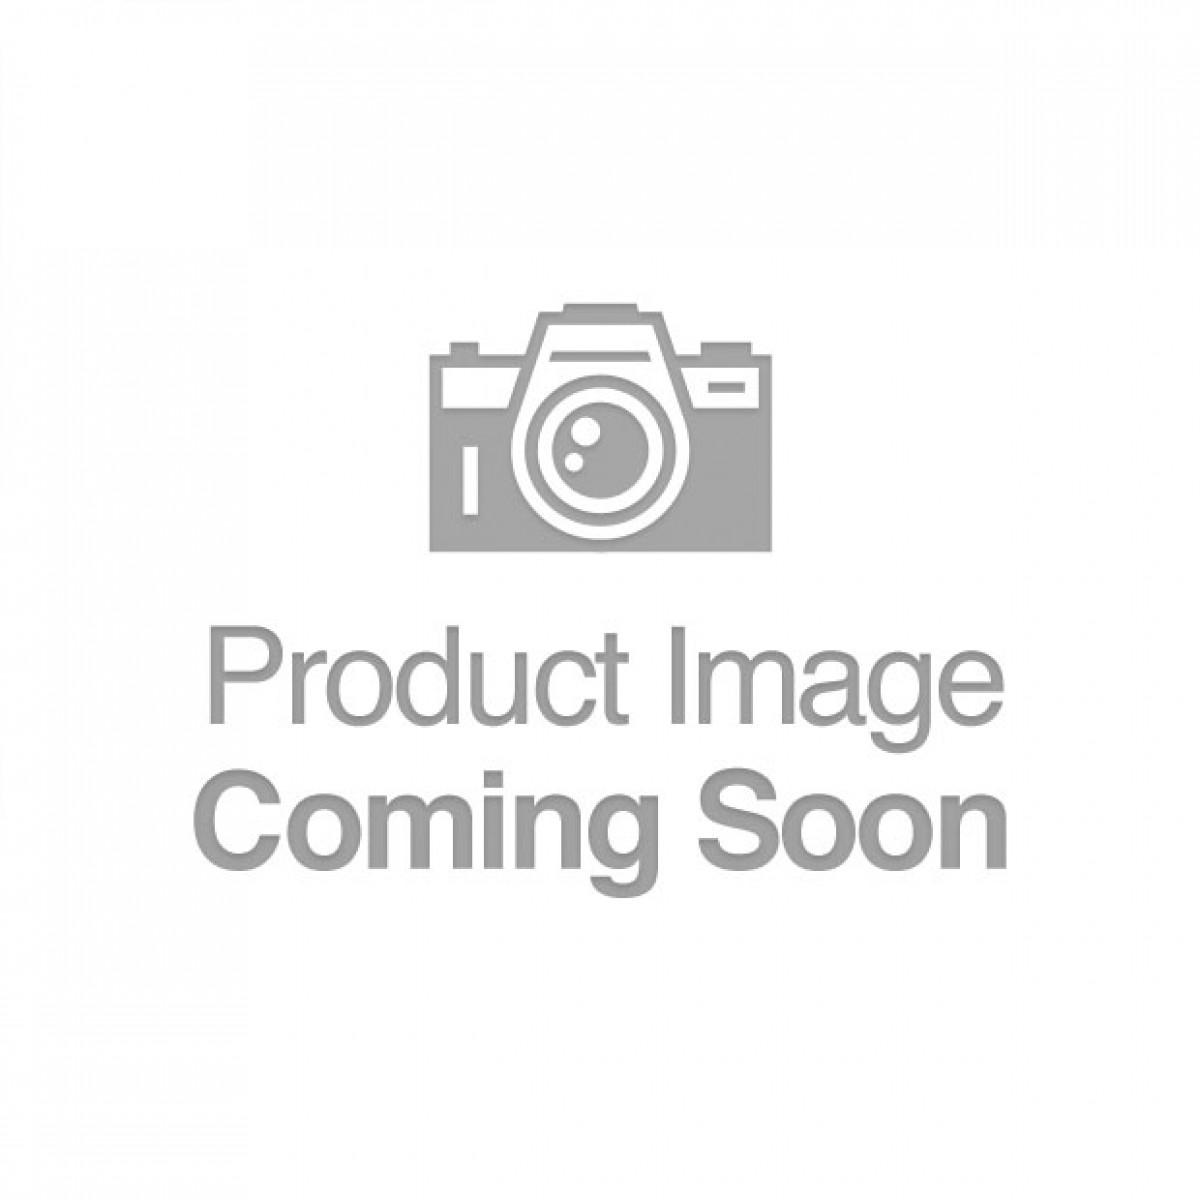 "Shots RealRock 7.5"" Silicone Dual Density Dildo - Flesh"